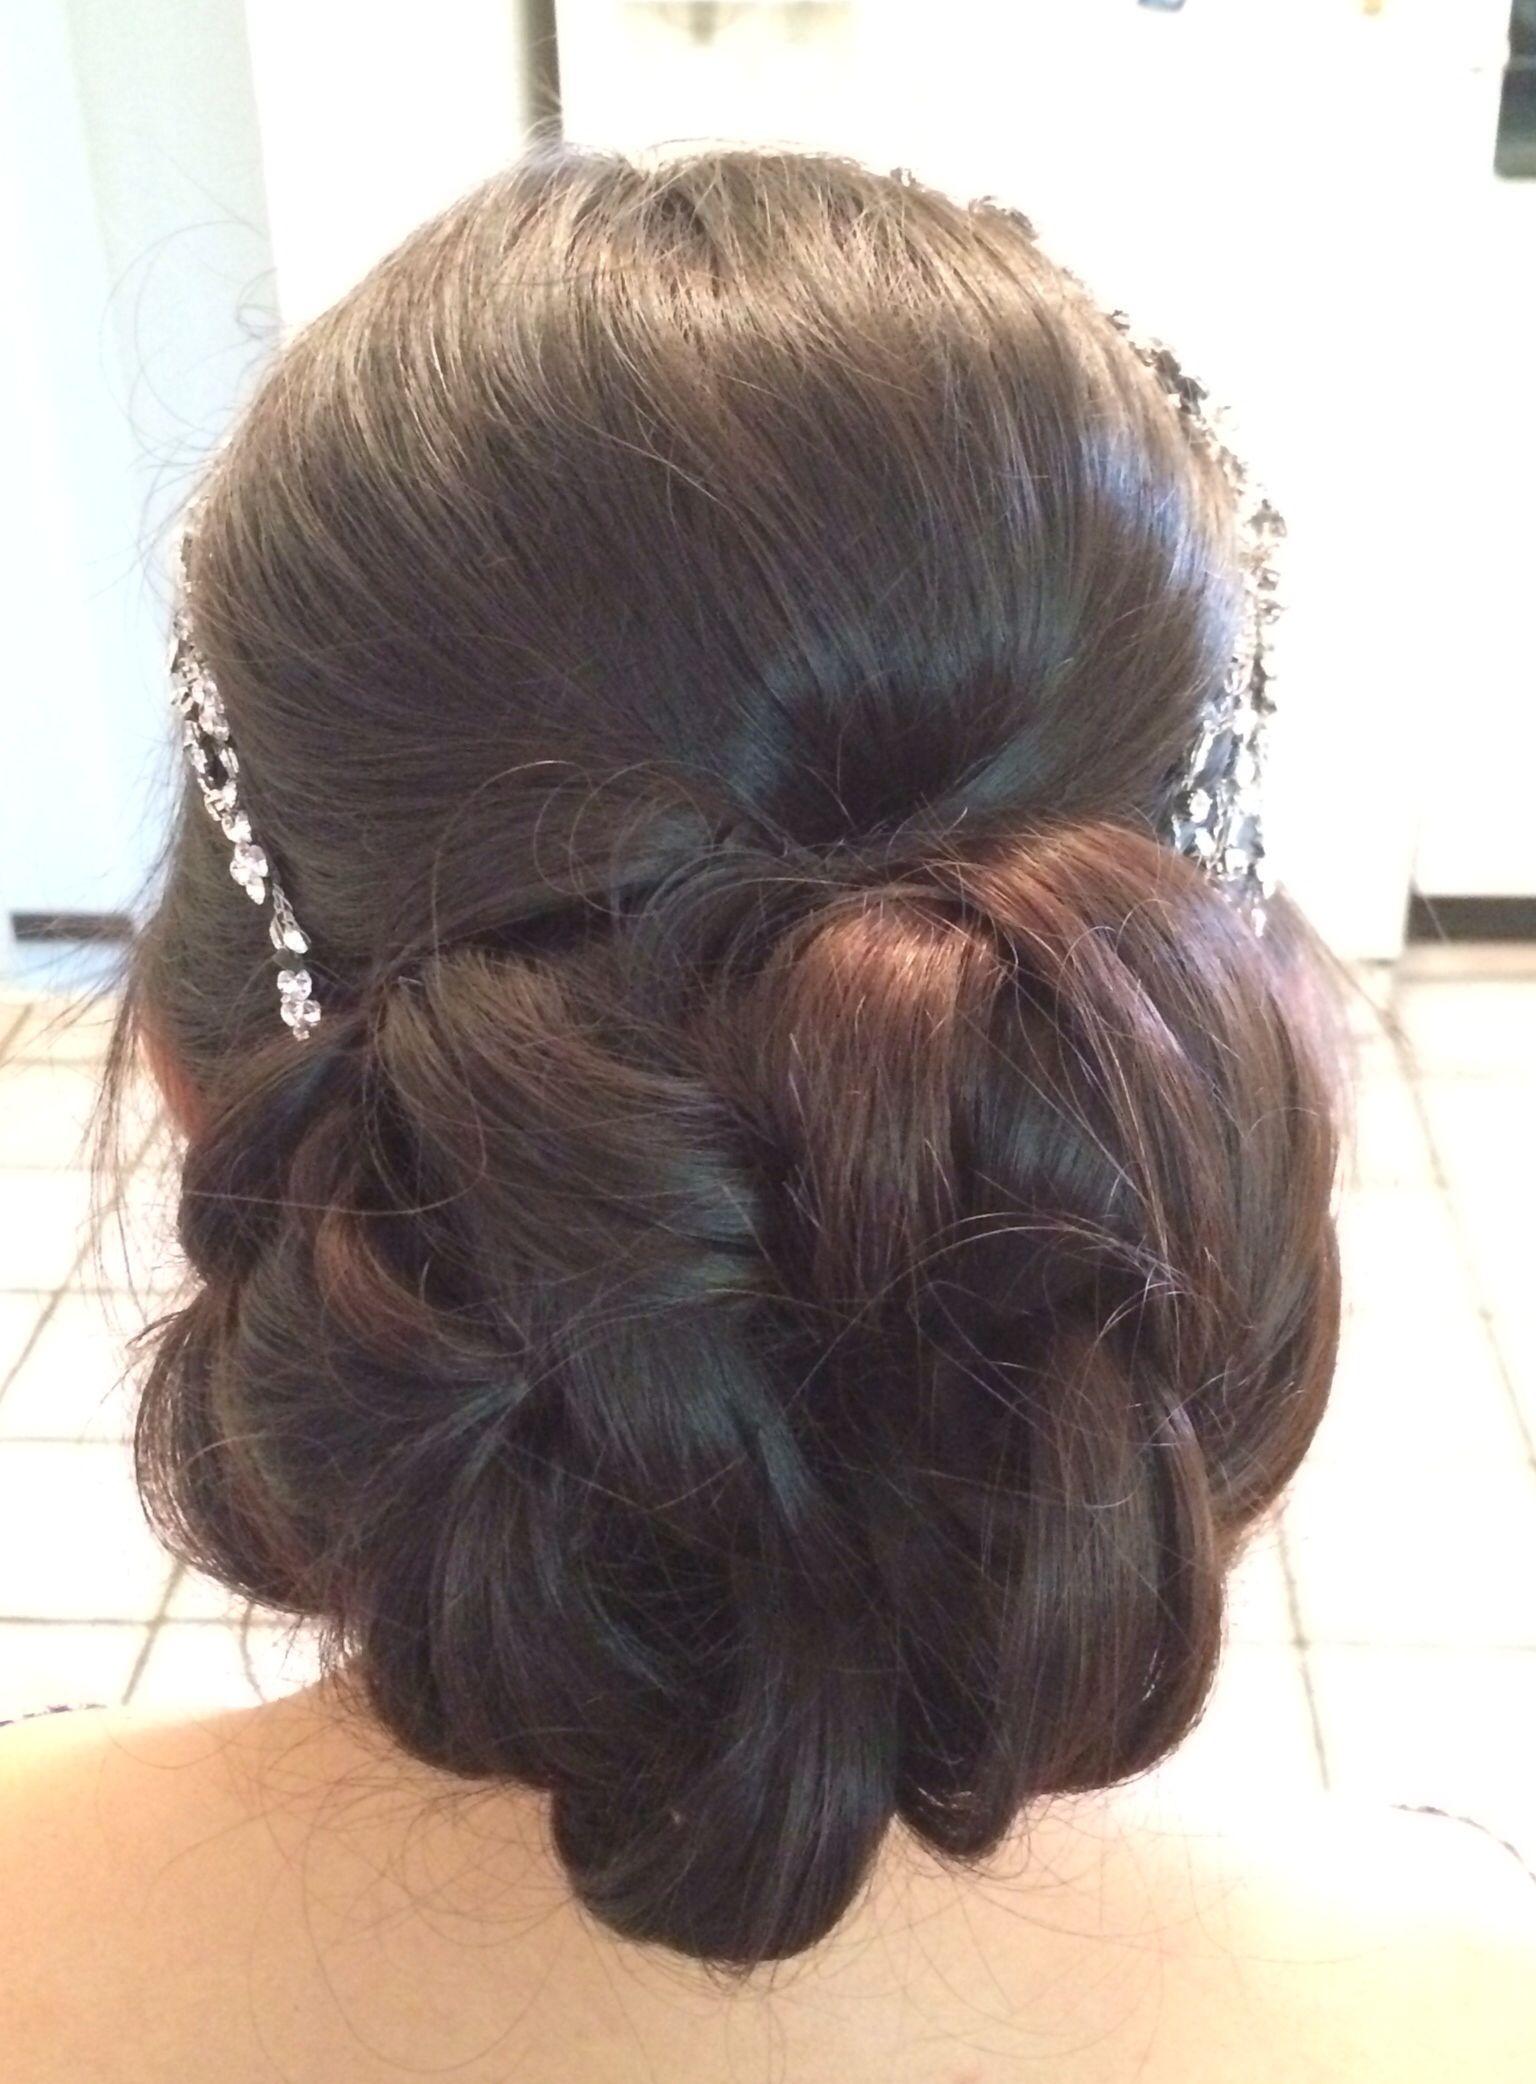 Pin Curl Up Do Hairstyle Beautiful Short Hair Medium Length Up Dos